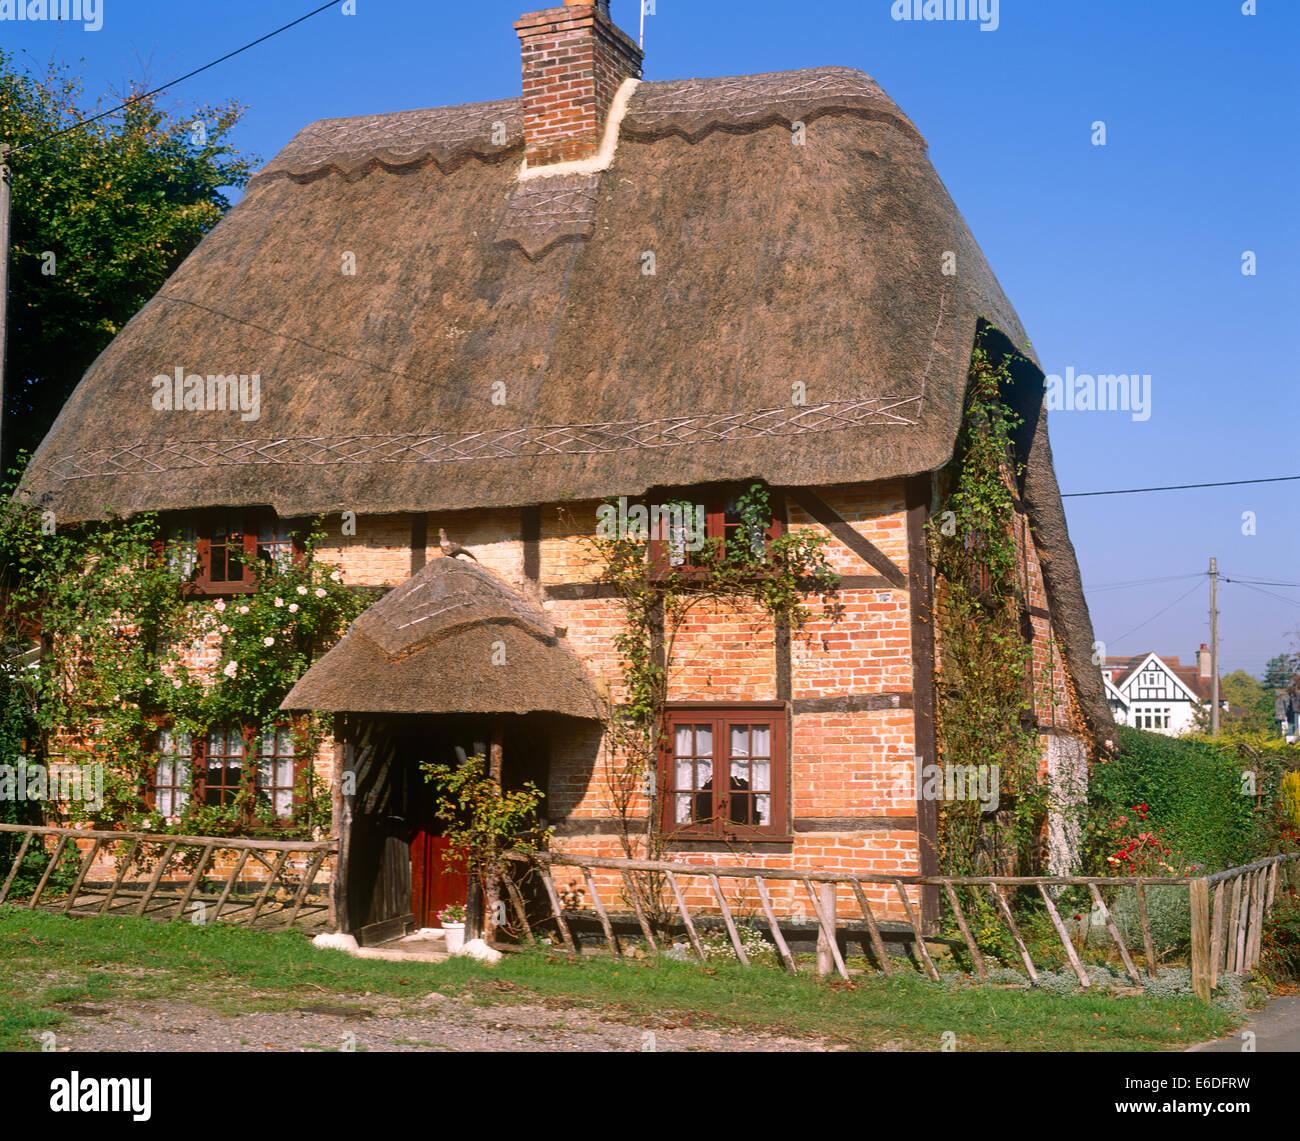 Reetdach-Ferienhaus Lyndhurst Hampshire UK Stockbild